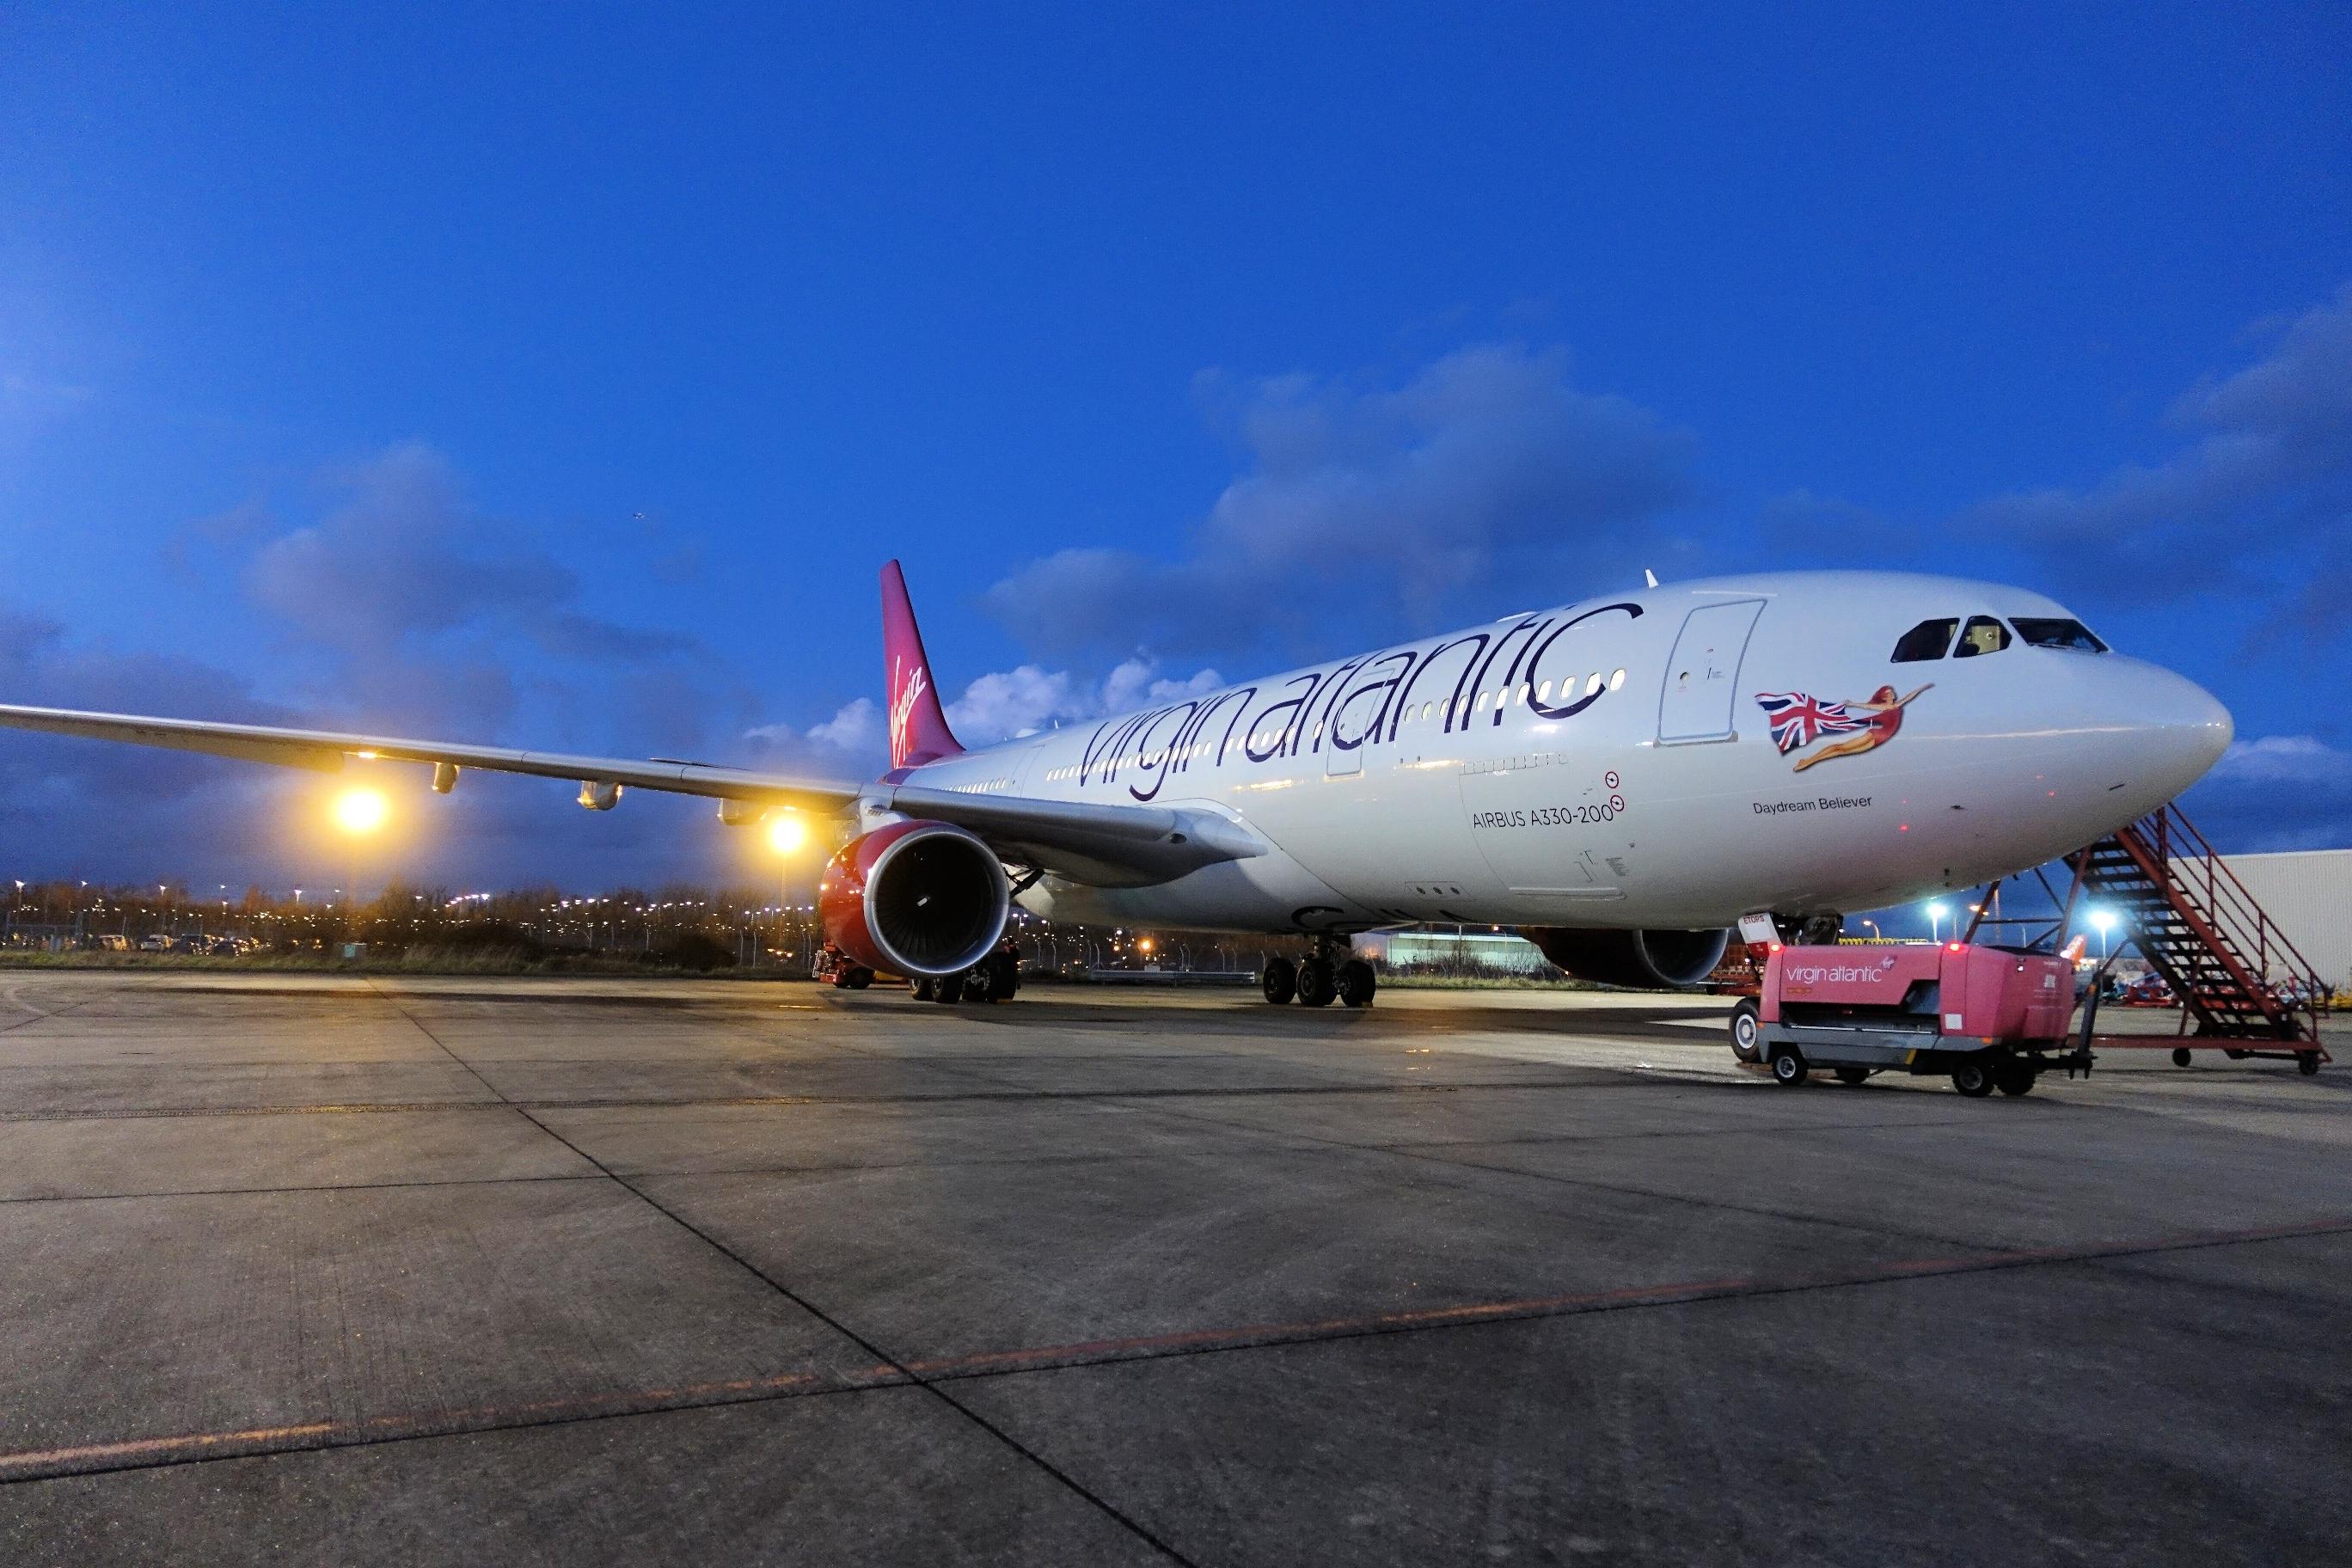 Virgin Atlantic Unveils Love Suites For Couples Who Perform PDA Virgin Atlantic Unveils Love Suites For Couples Who Perform PDA new picture